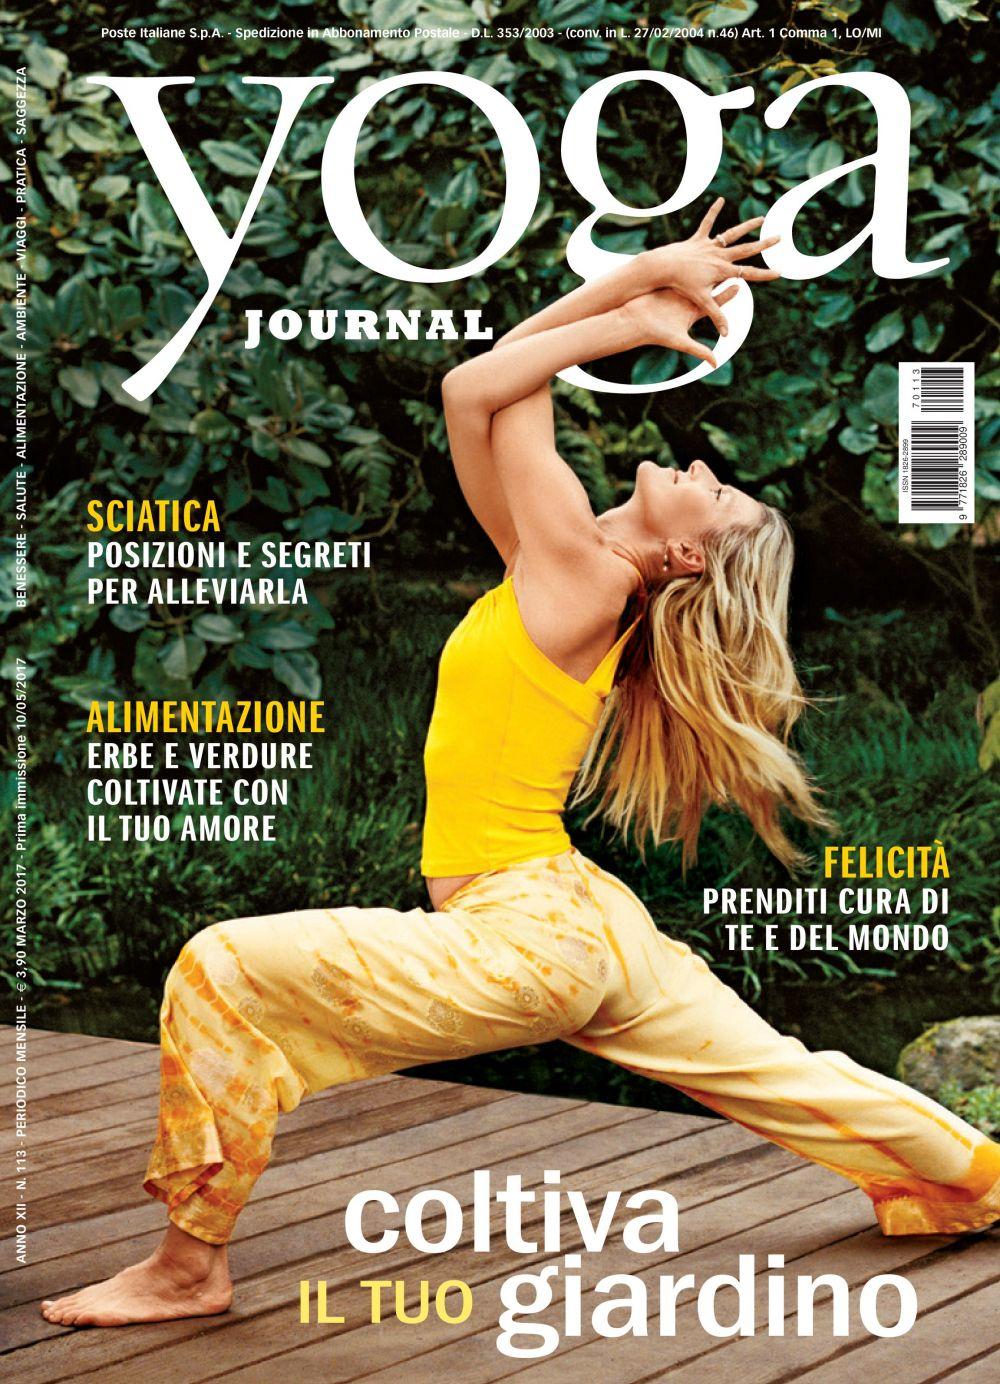 Yoga Journal Maggio n. 113